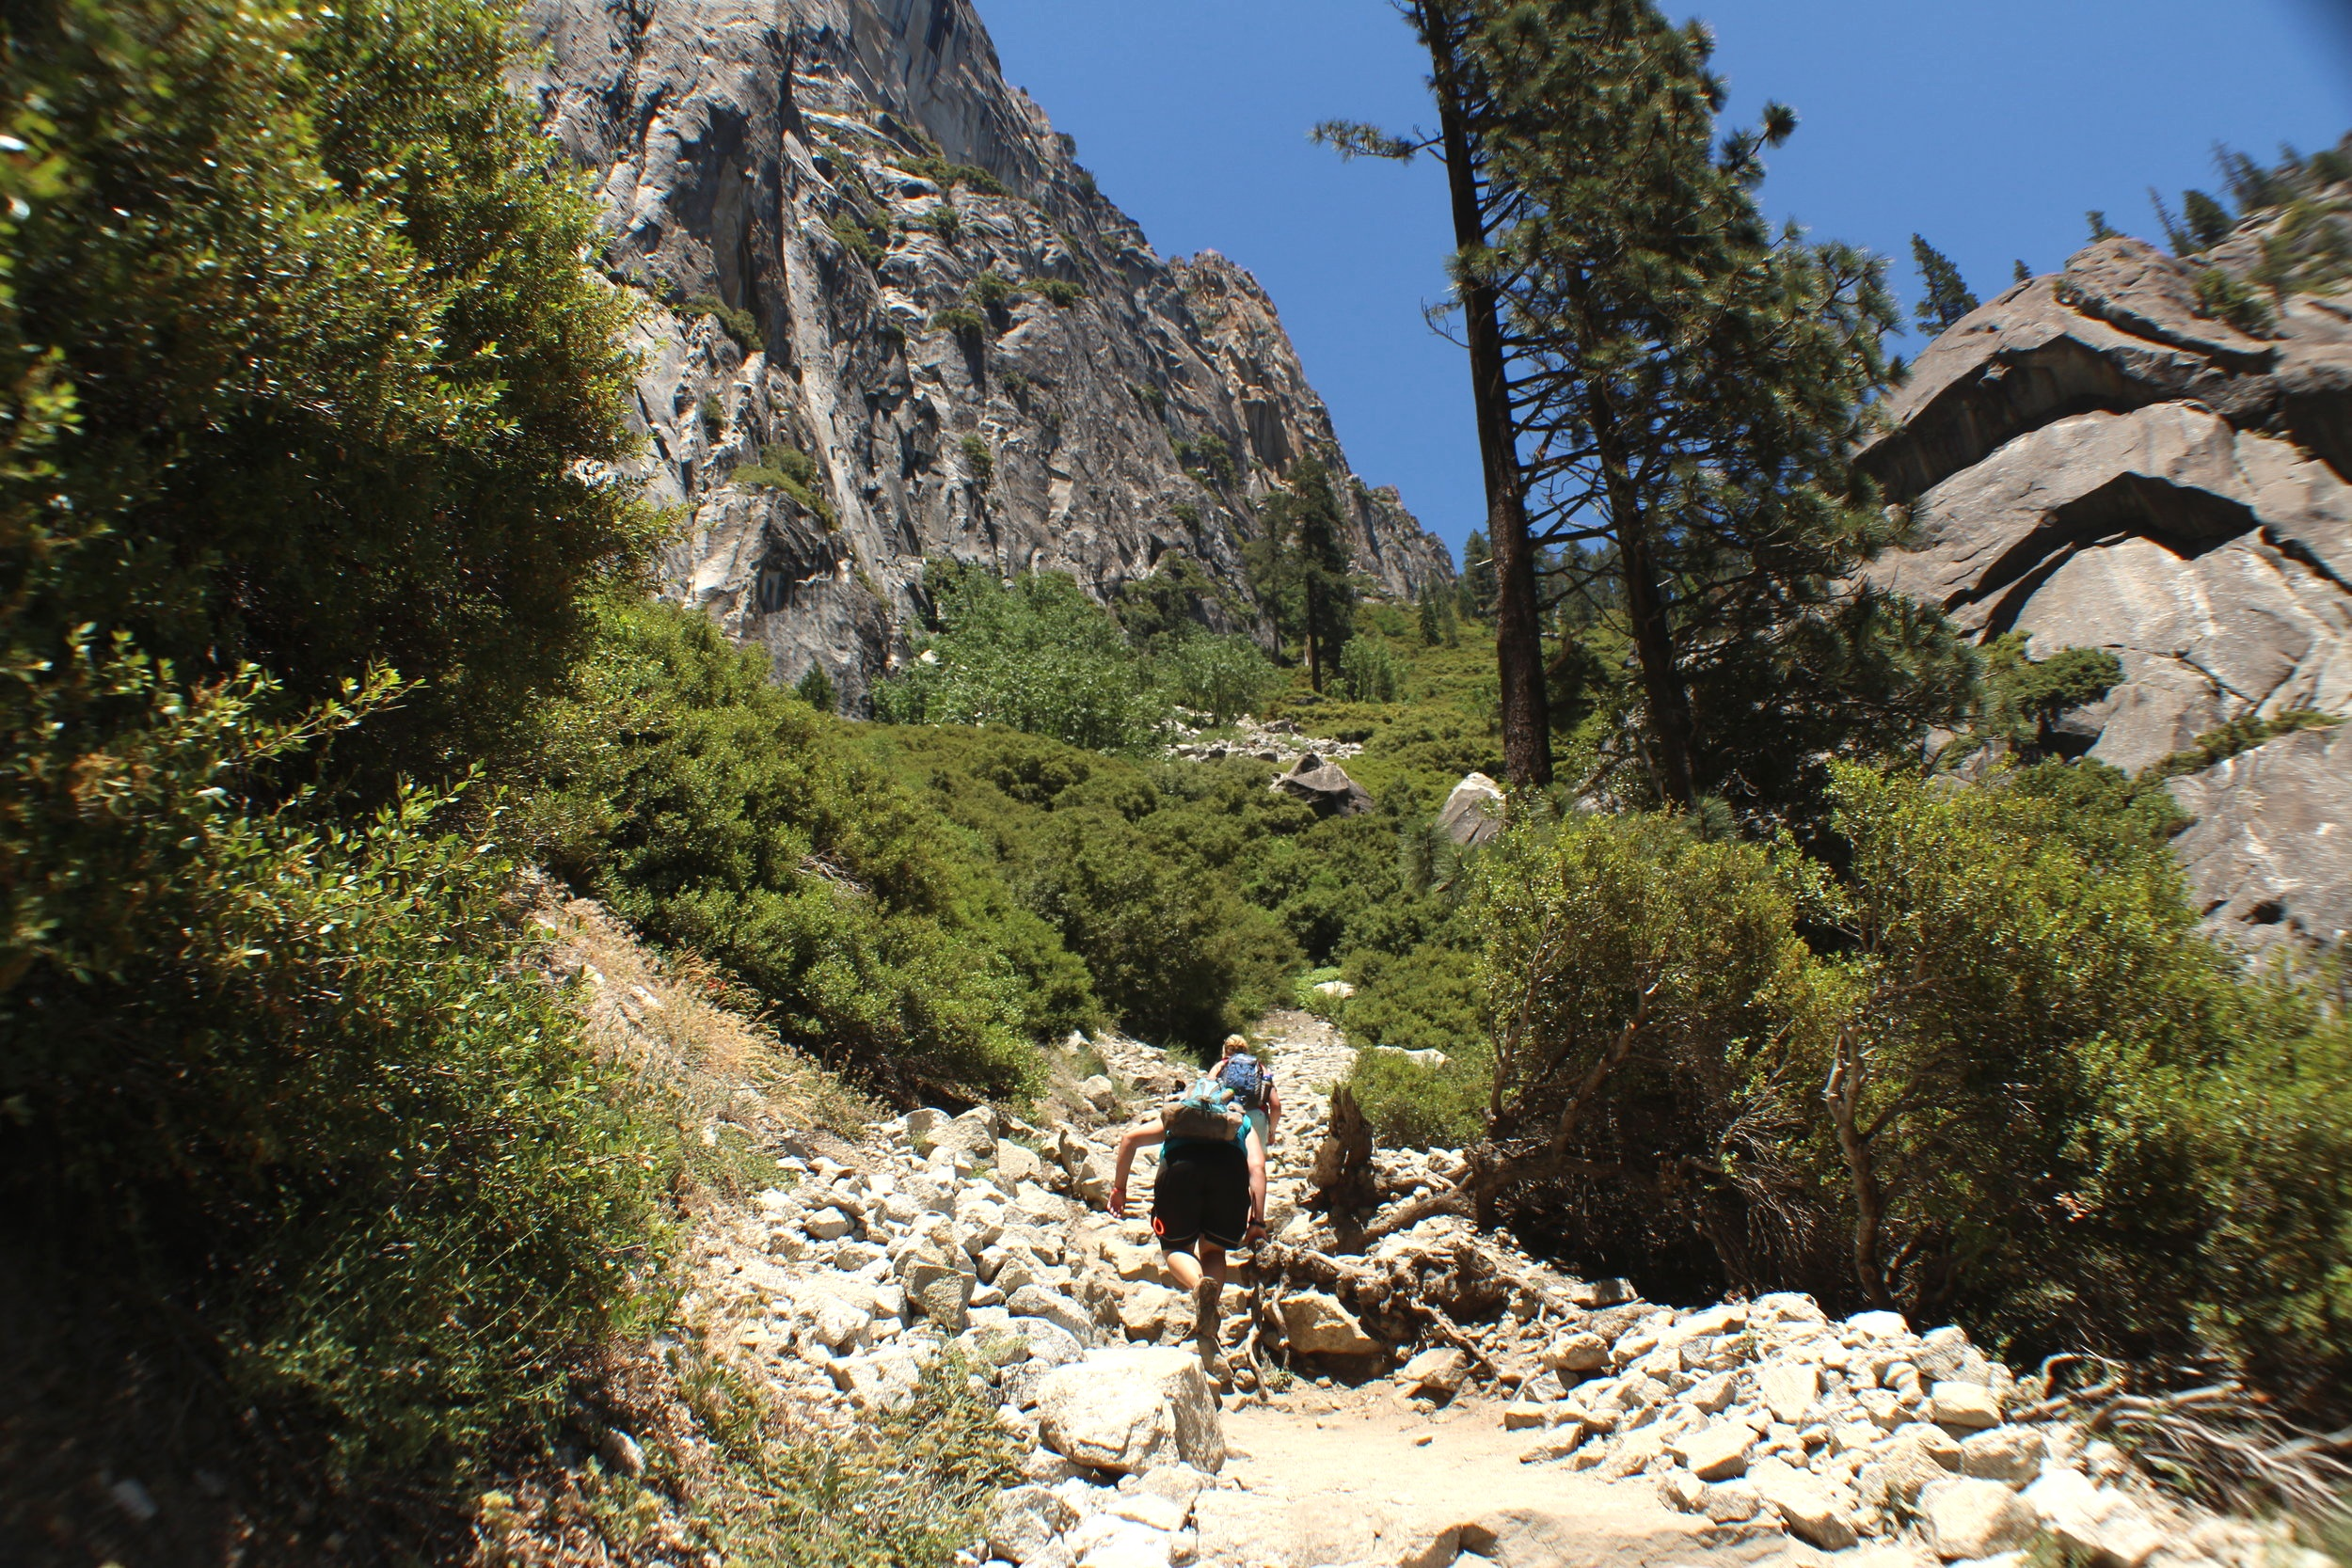 Halfway mark to the top of Upper Yosemite Falls